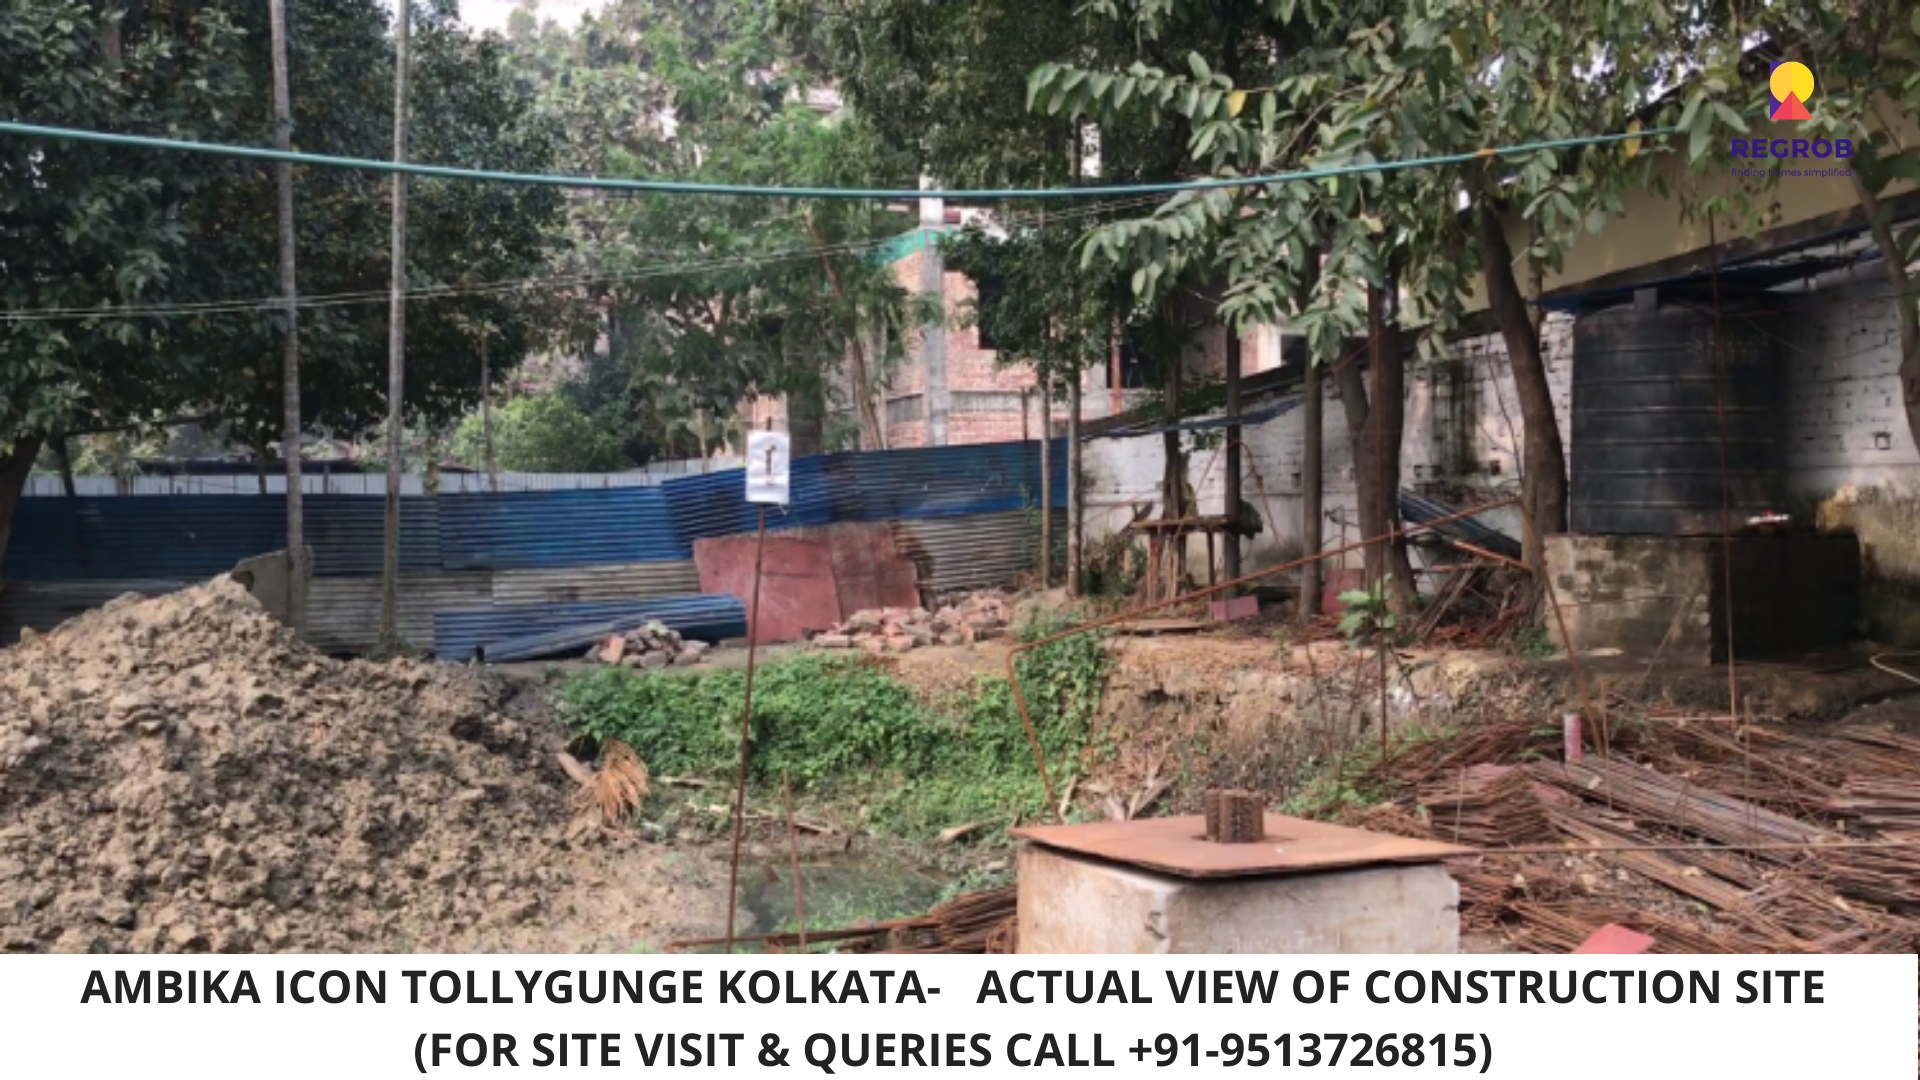 Ambika Icon Tollygunge Kolkata